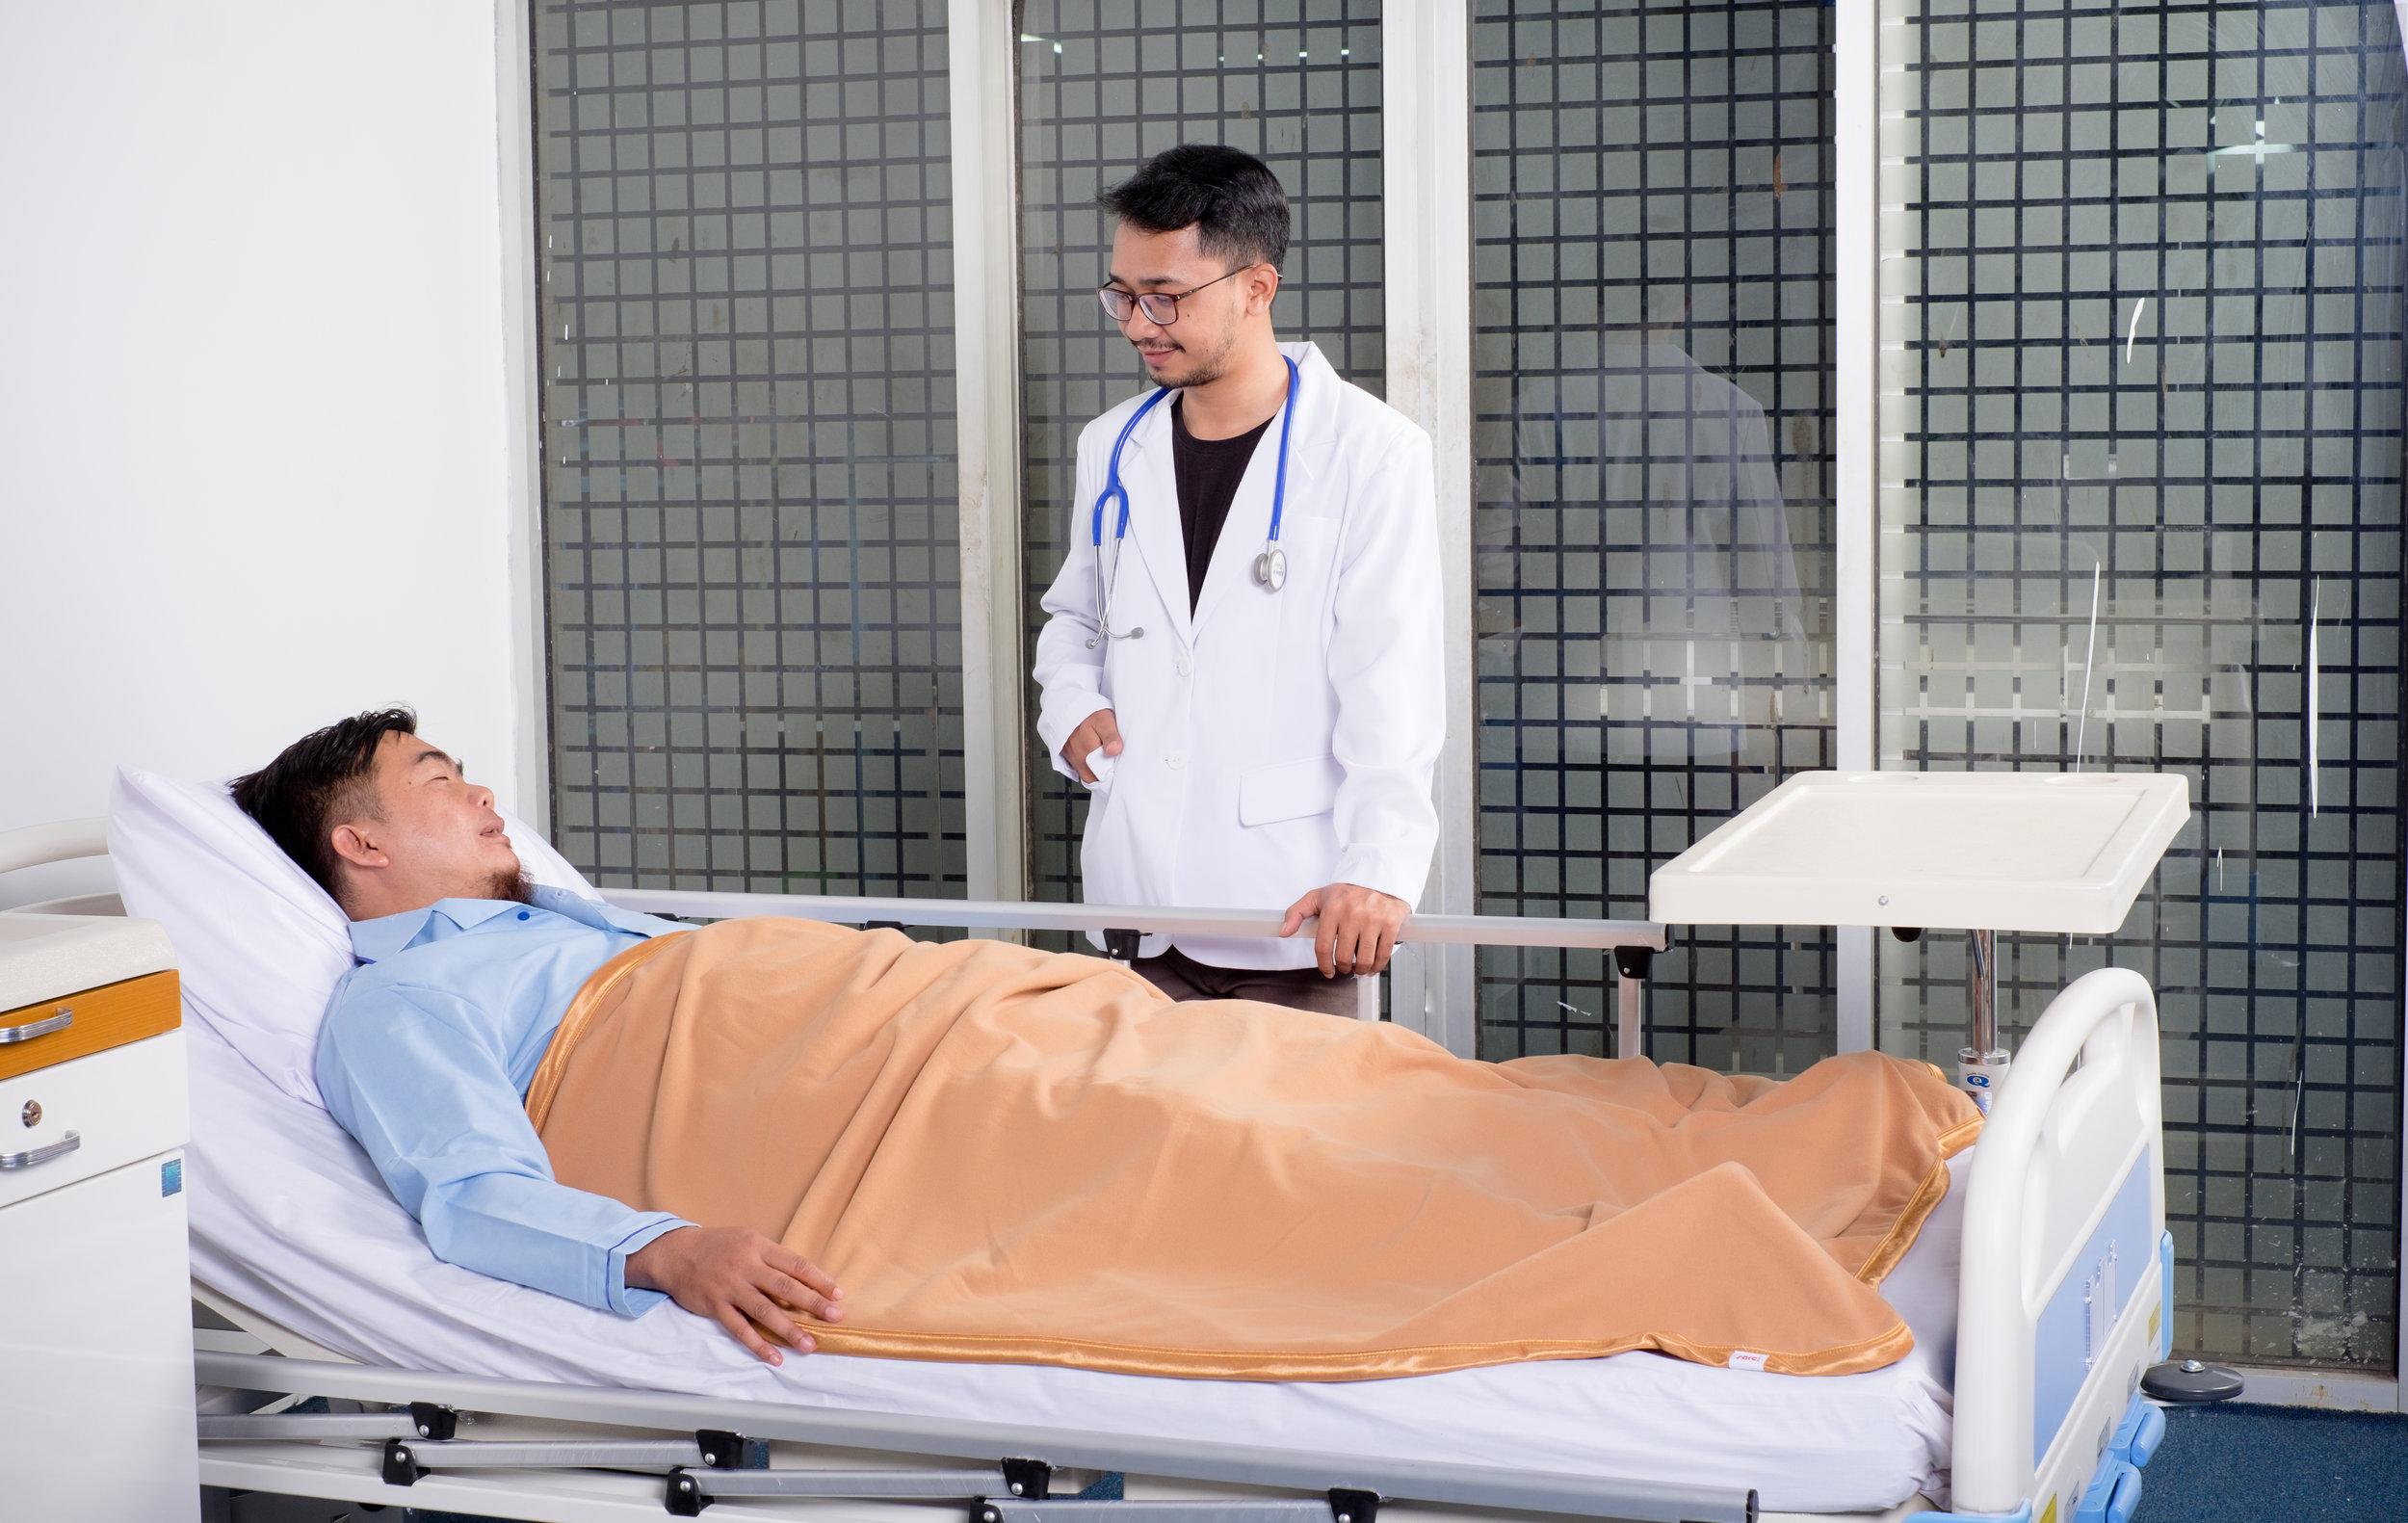 Medical Coder – Evaluation and Management (E&M) -